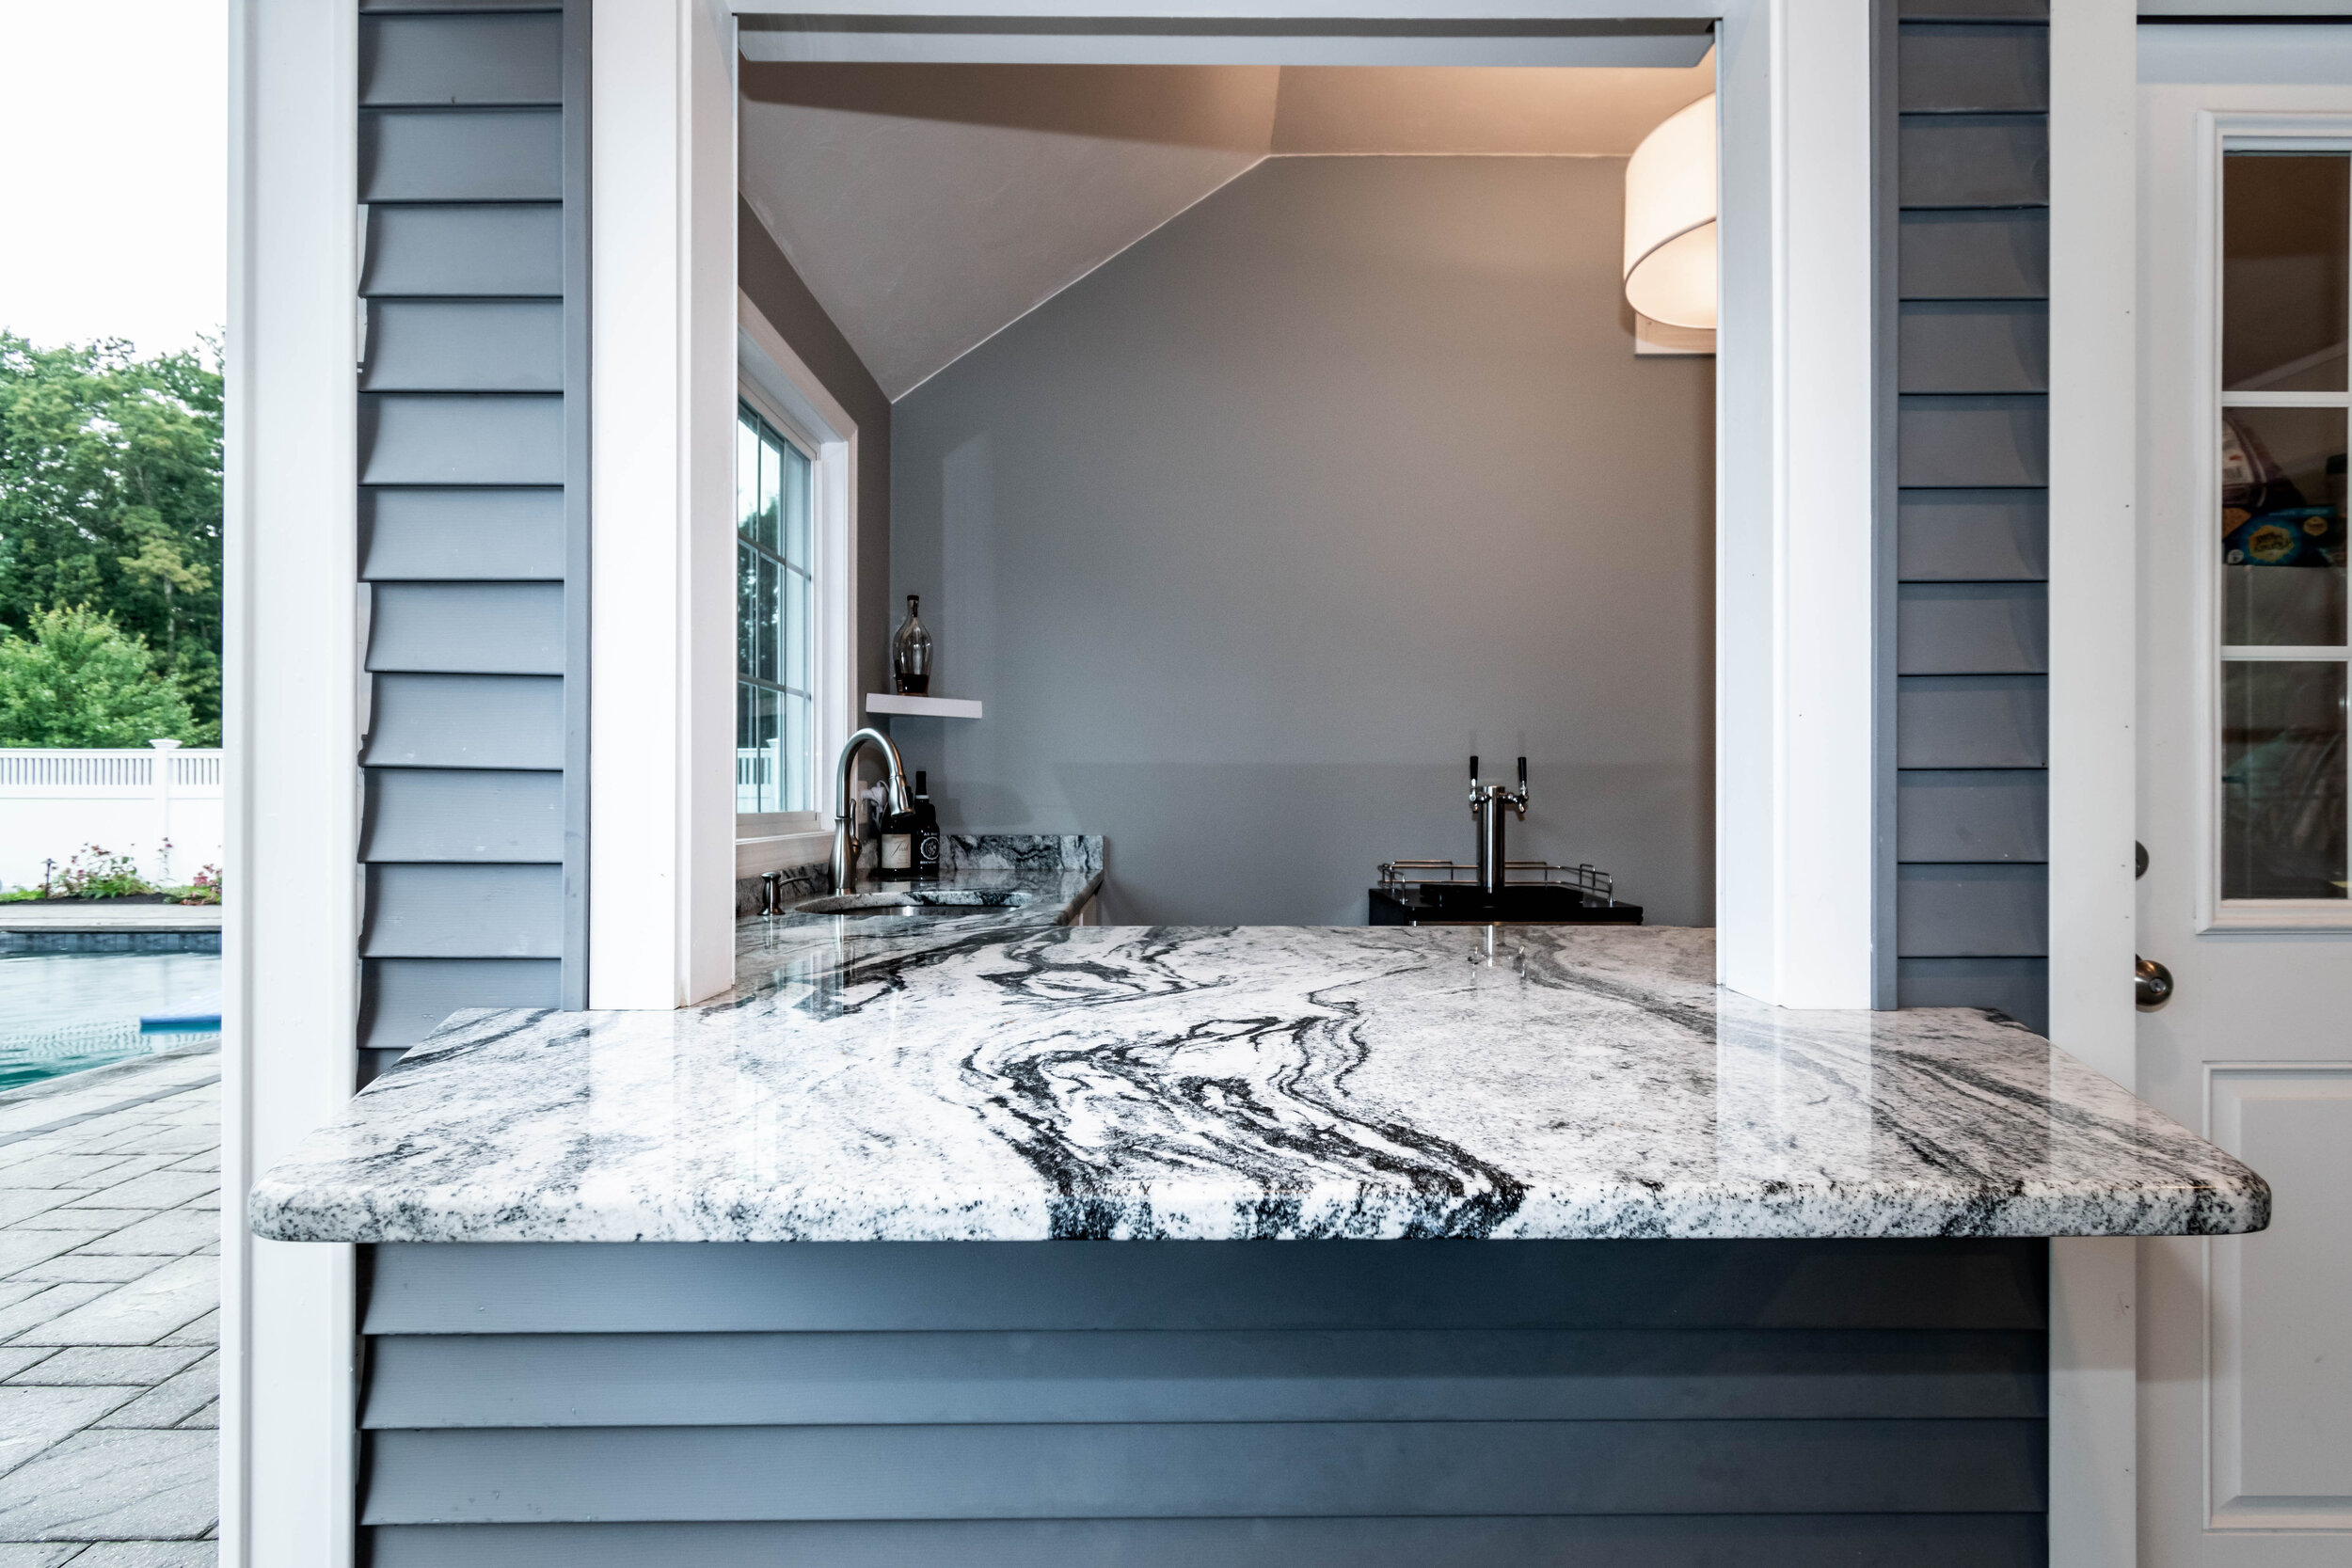 "Material: Viscount White  Thickness, Finish & Stone Type: 3CM Polished Granite  Edge: 3/8"" Radius  Sink: KB18-SP1"